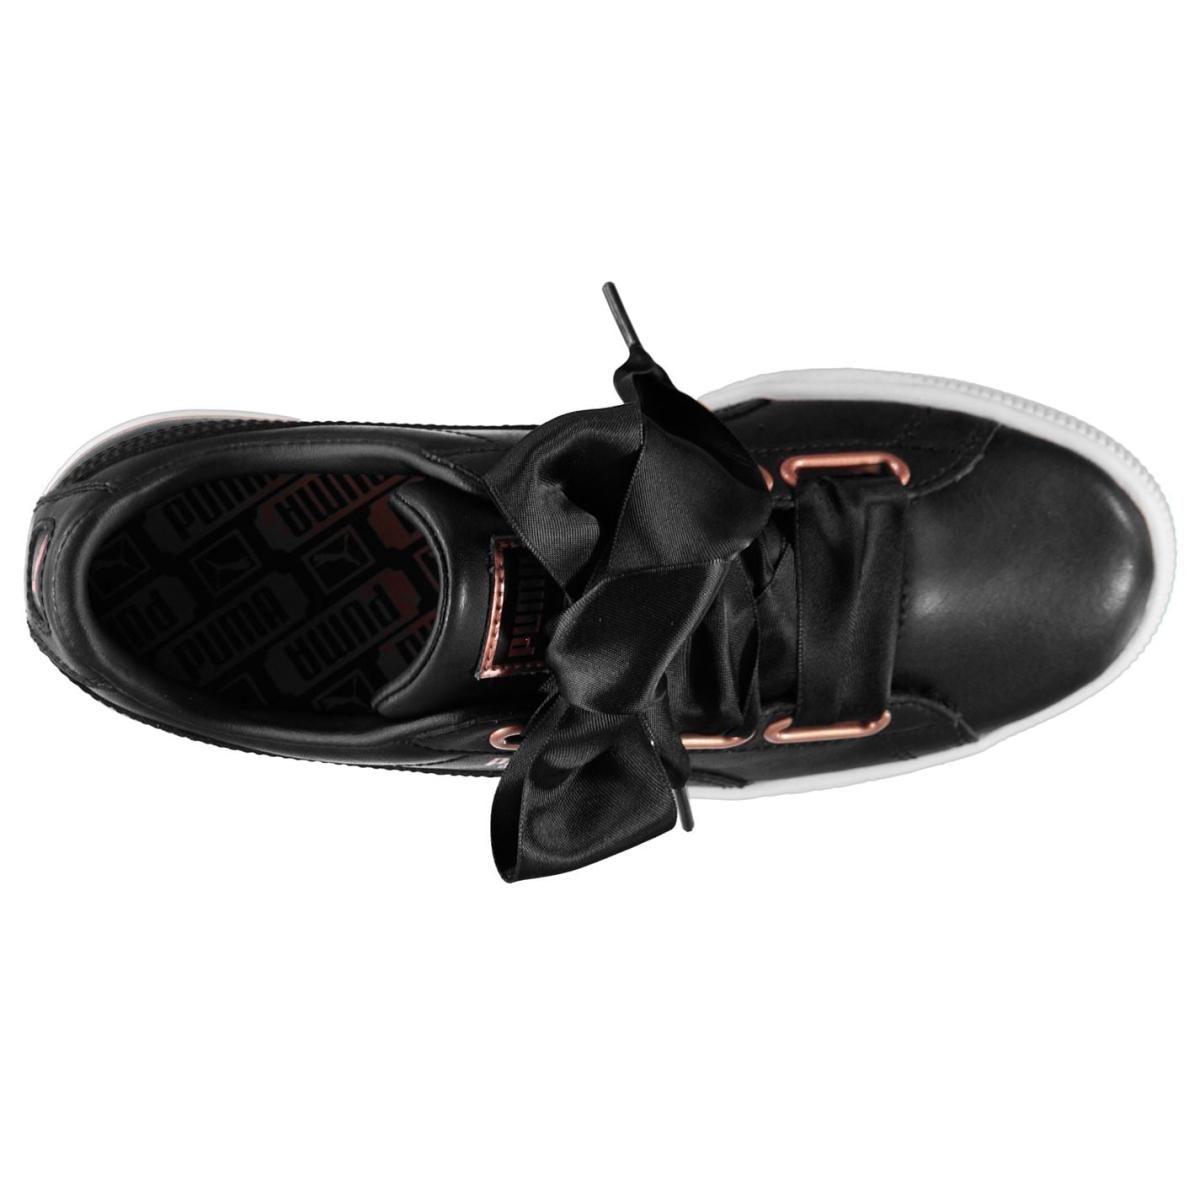 Puma-Basket-Turnschuhe-Damen-Sneaker-Sportschuhe-Laufschuhe-9081 Indexbild 4